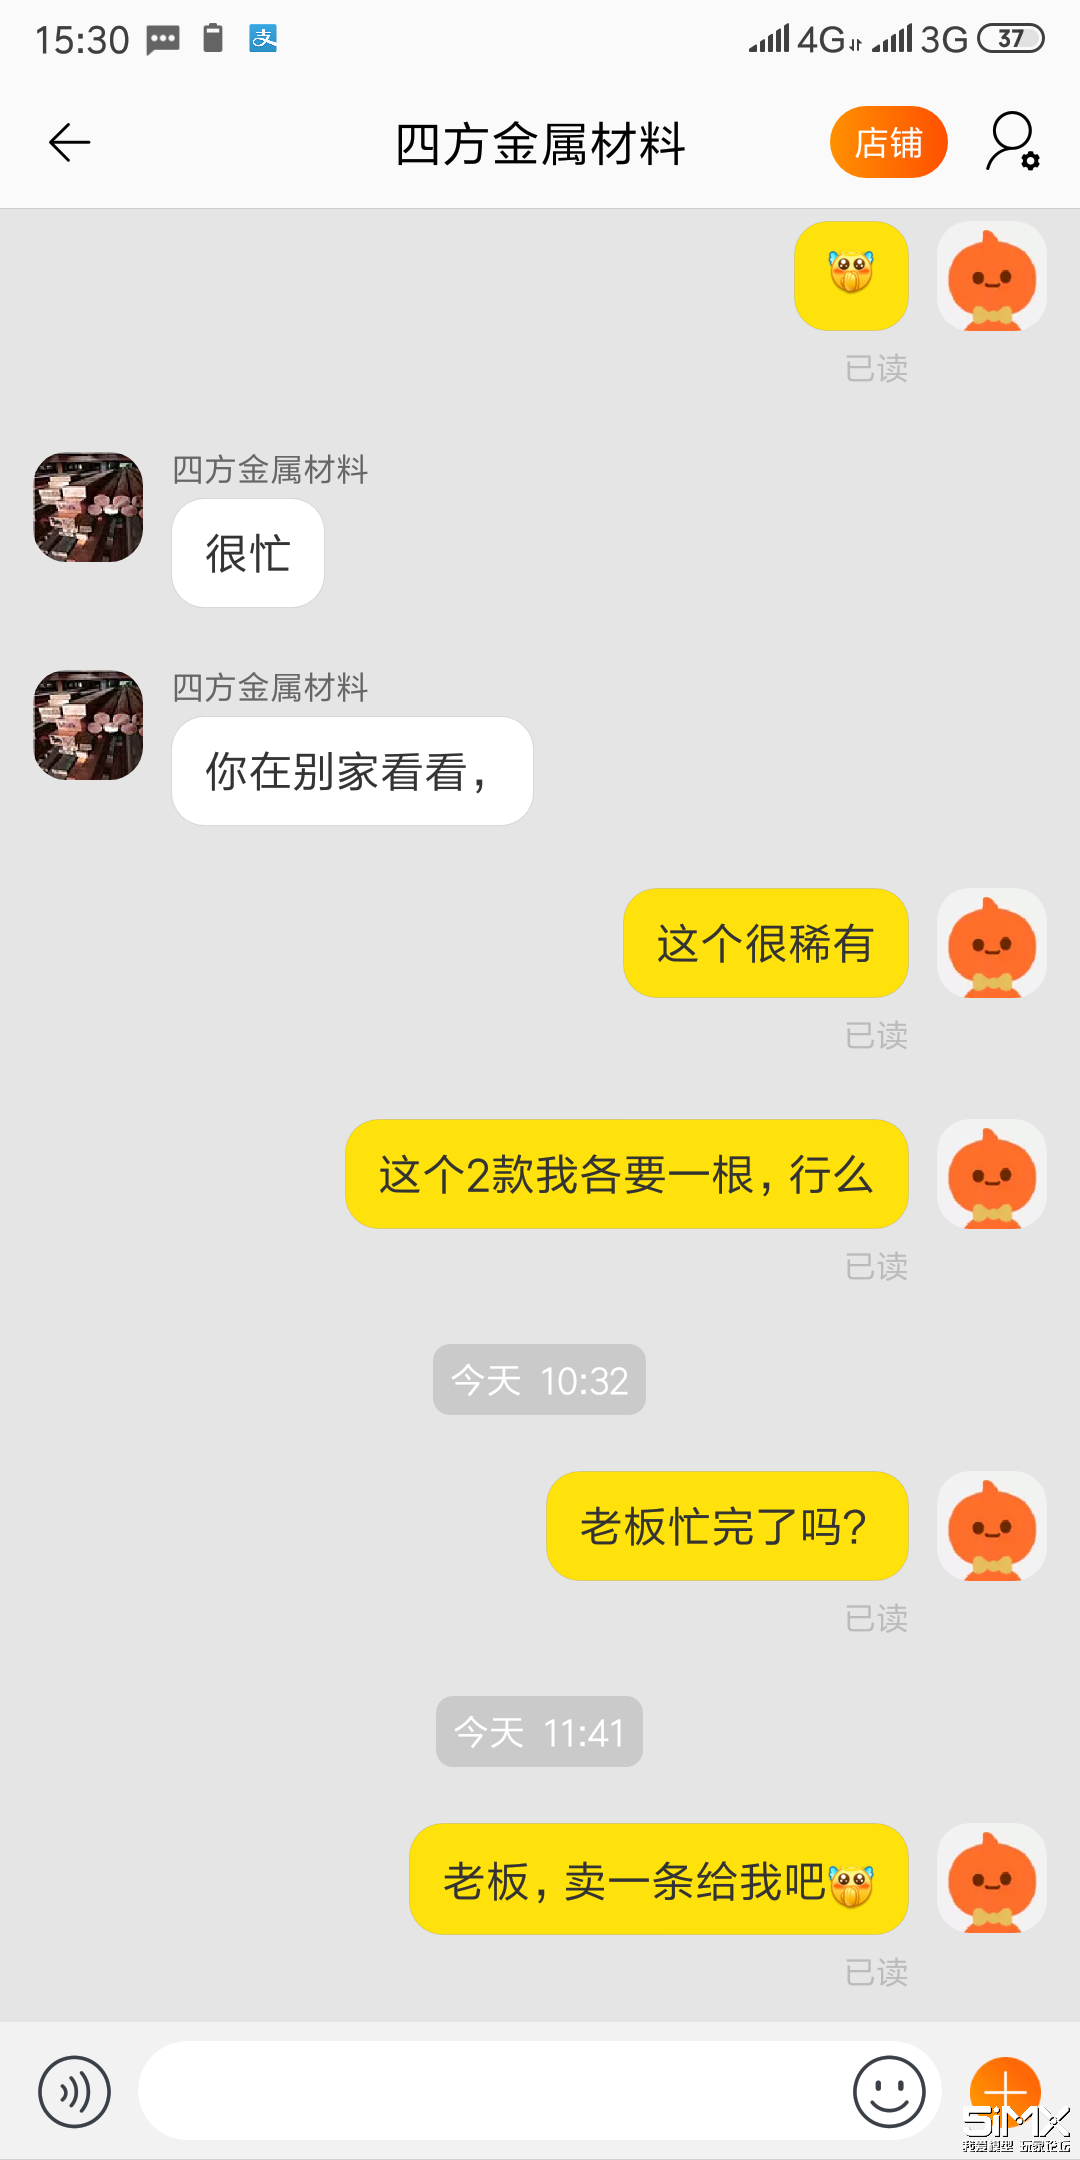 Screenshot_2019-08-13-15-30-25-140_com.taobao.taobao.png